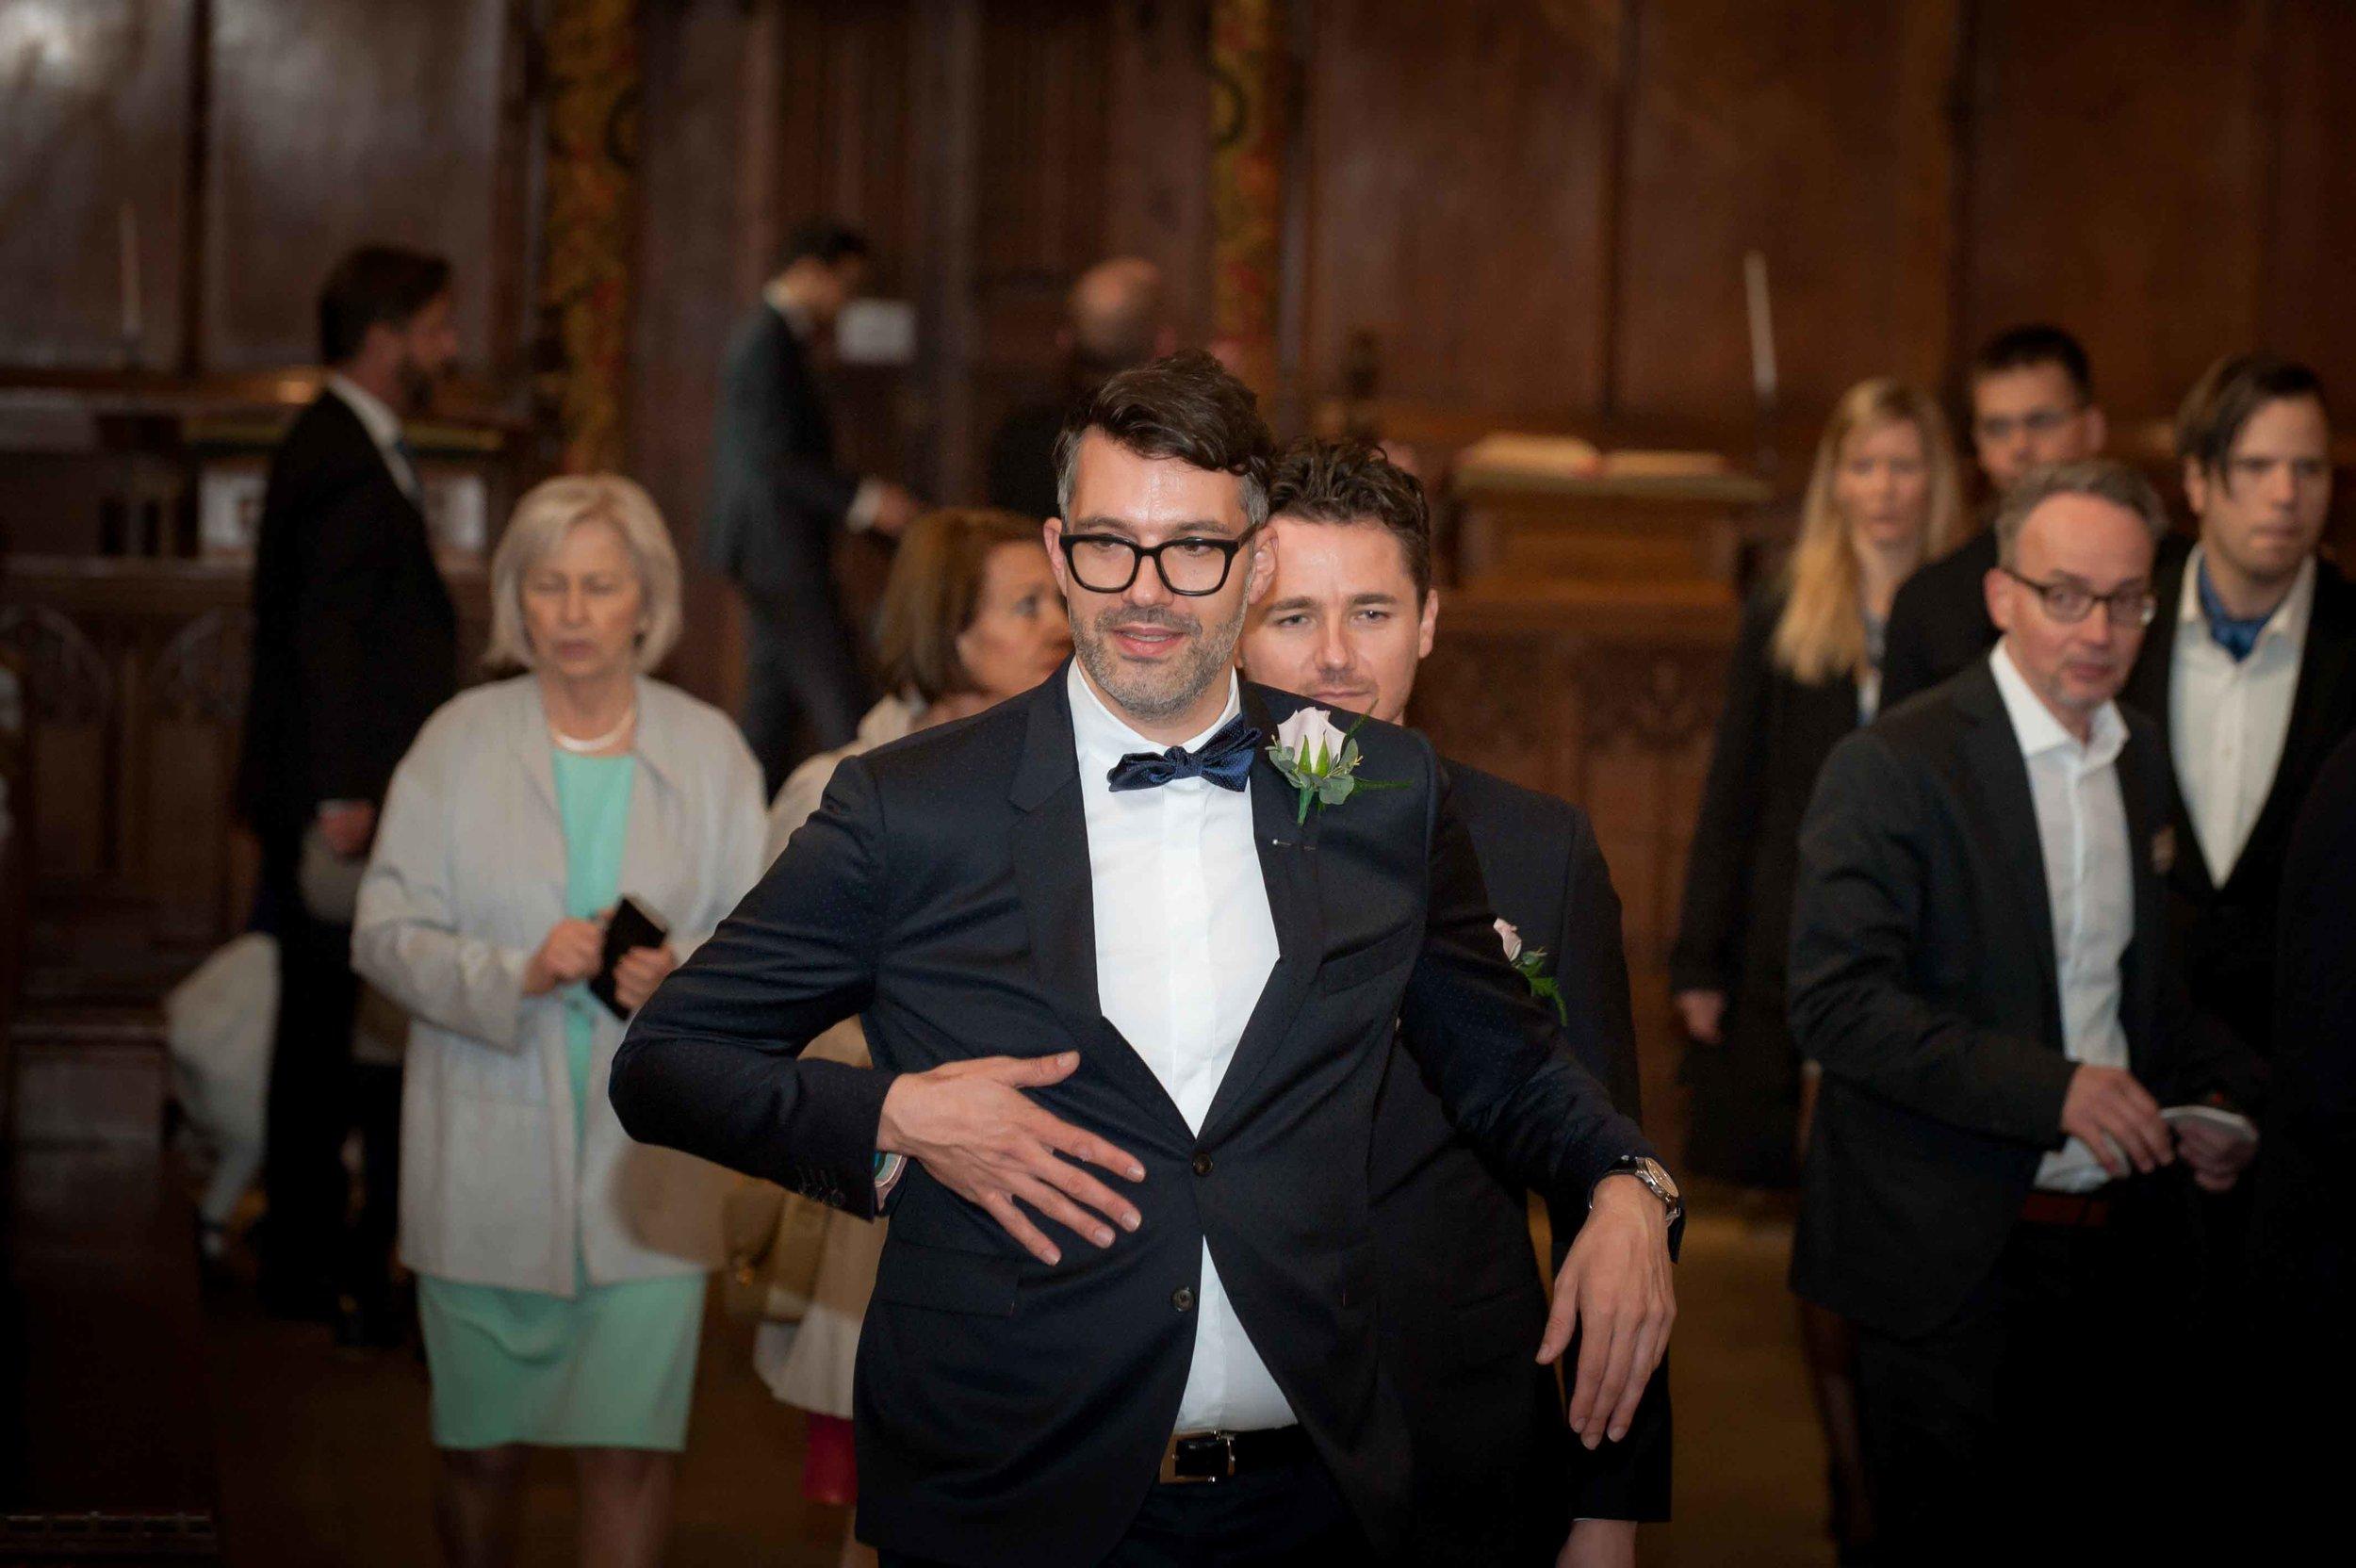 Adrian_Nicole_Charnwood_Weddings_Queens_College_Cambridge-1012.jpg